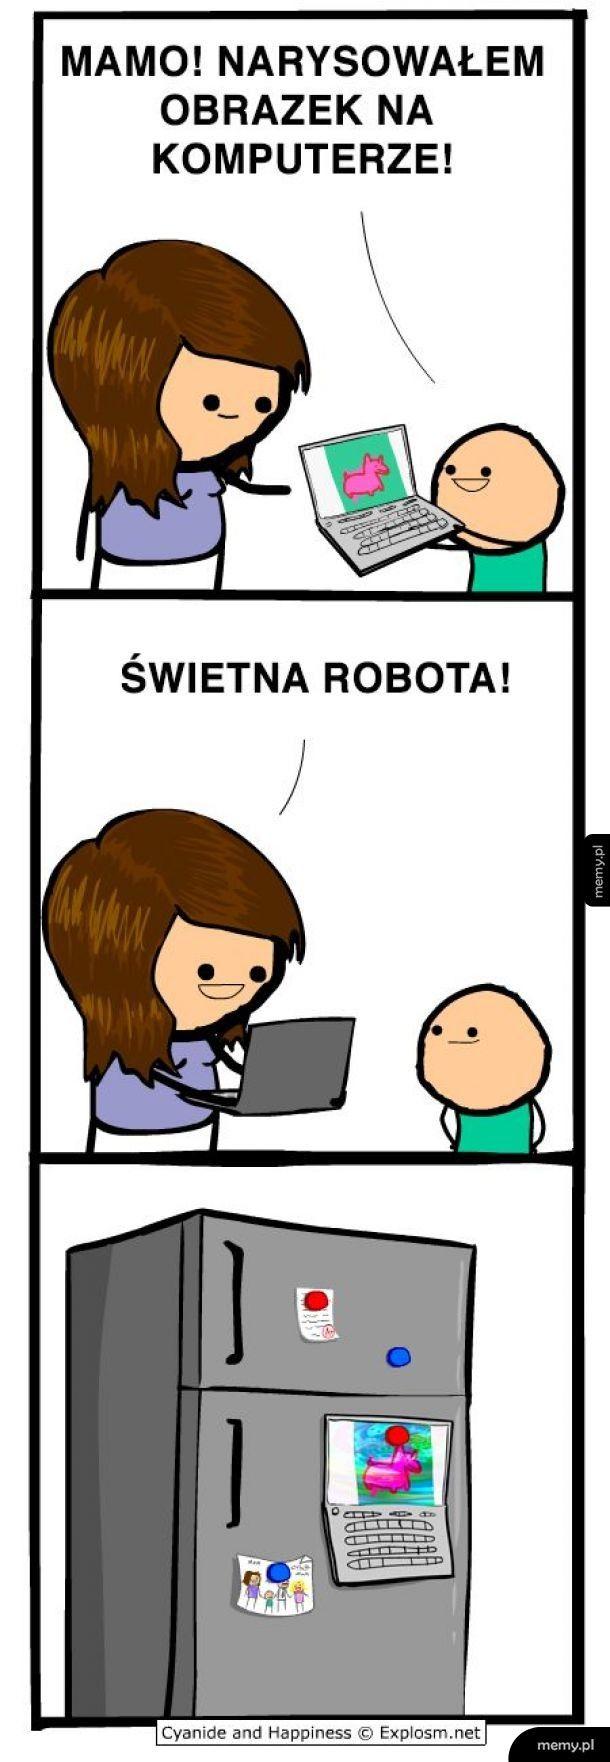 Obrazek na komputerze